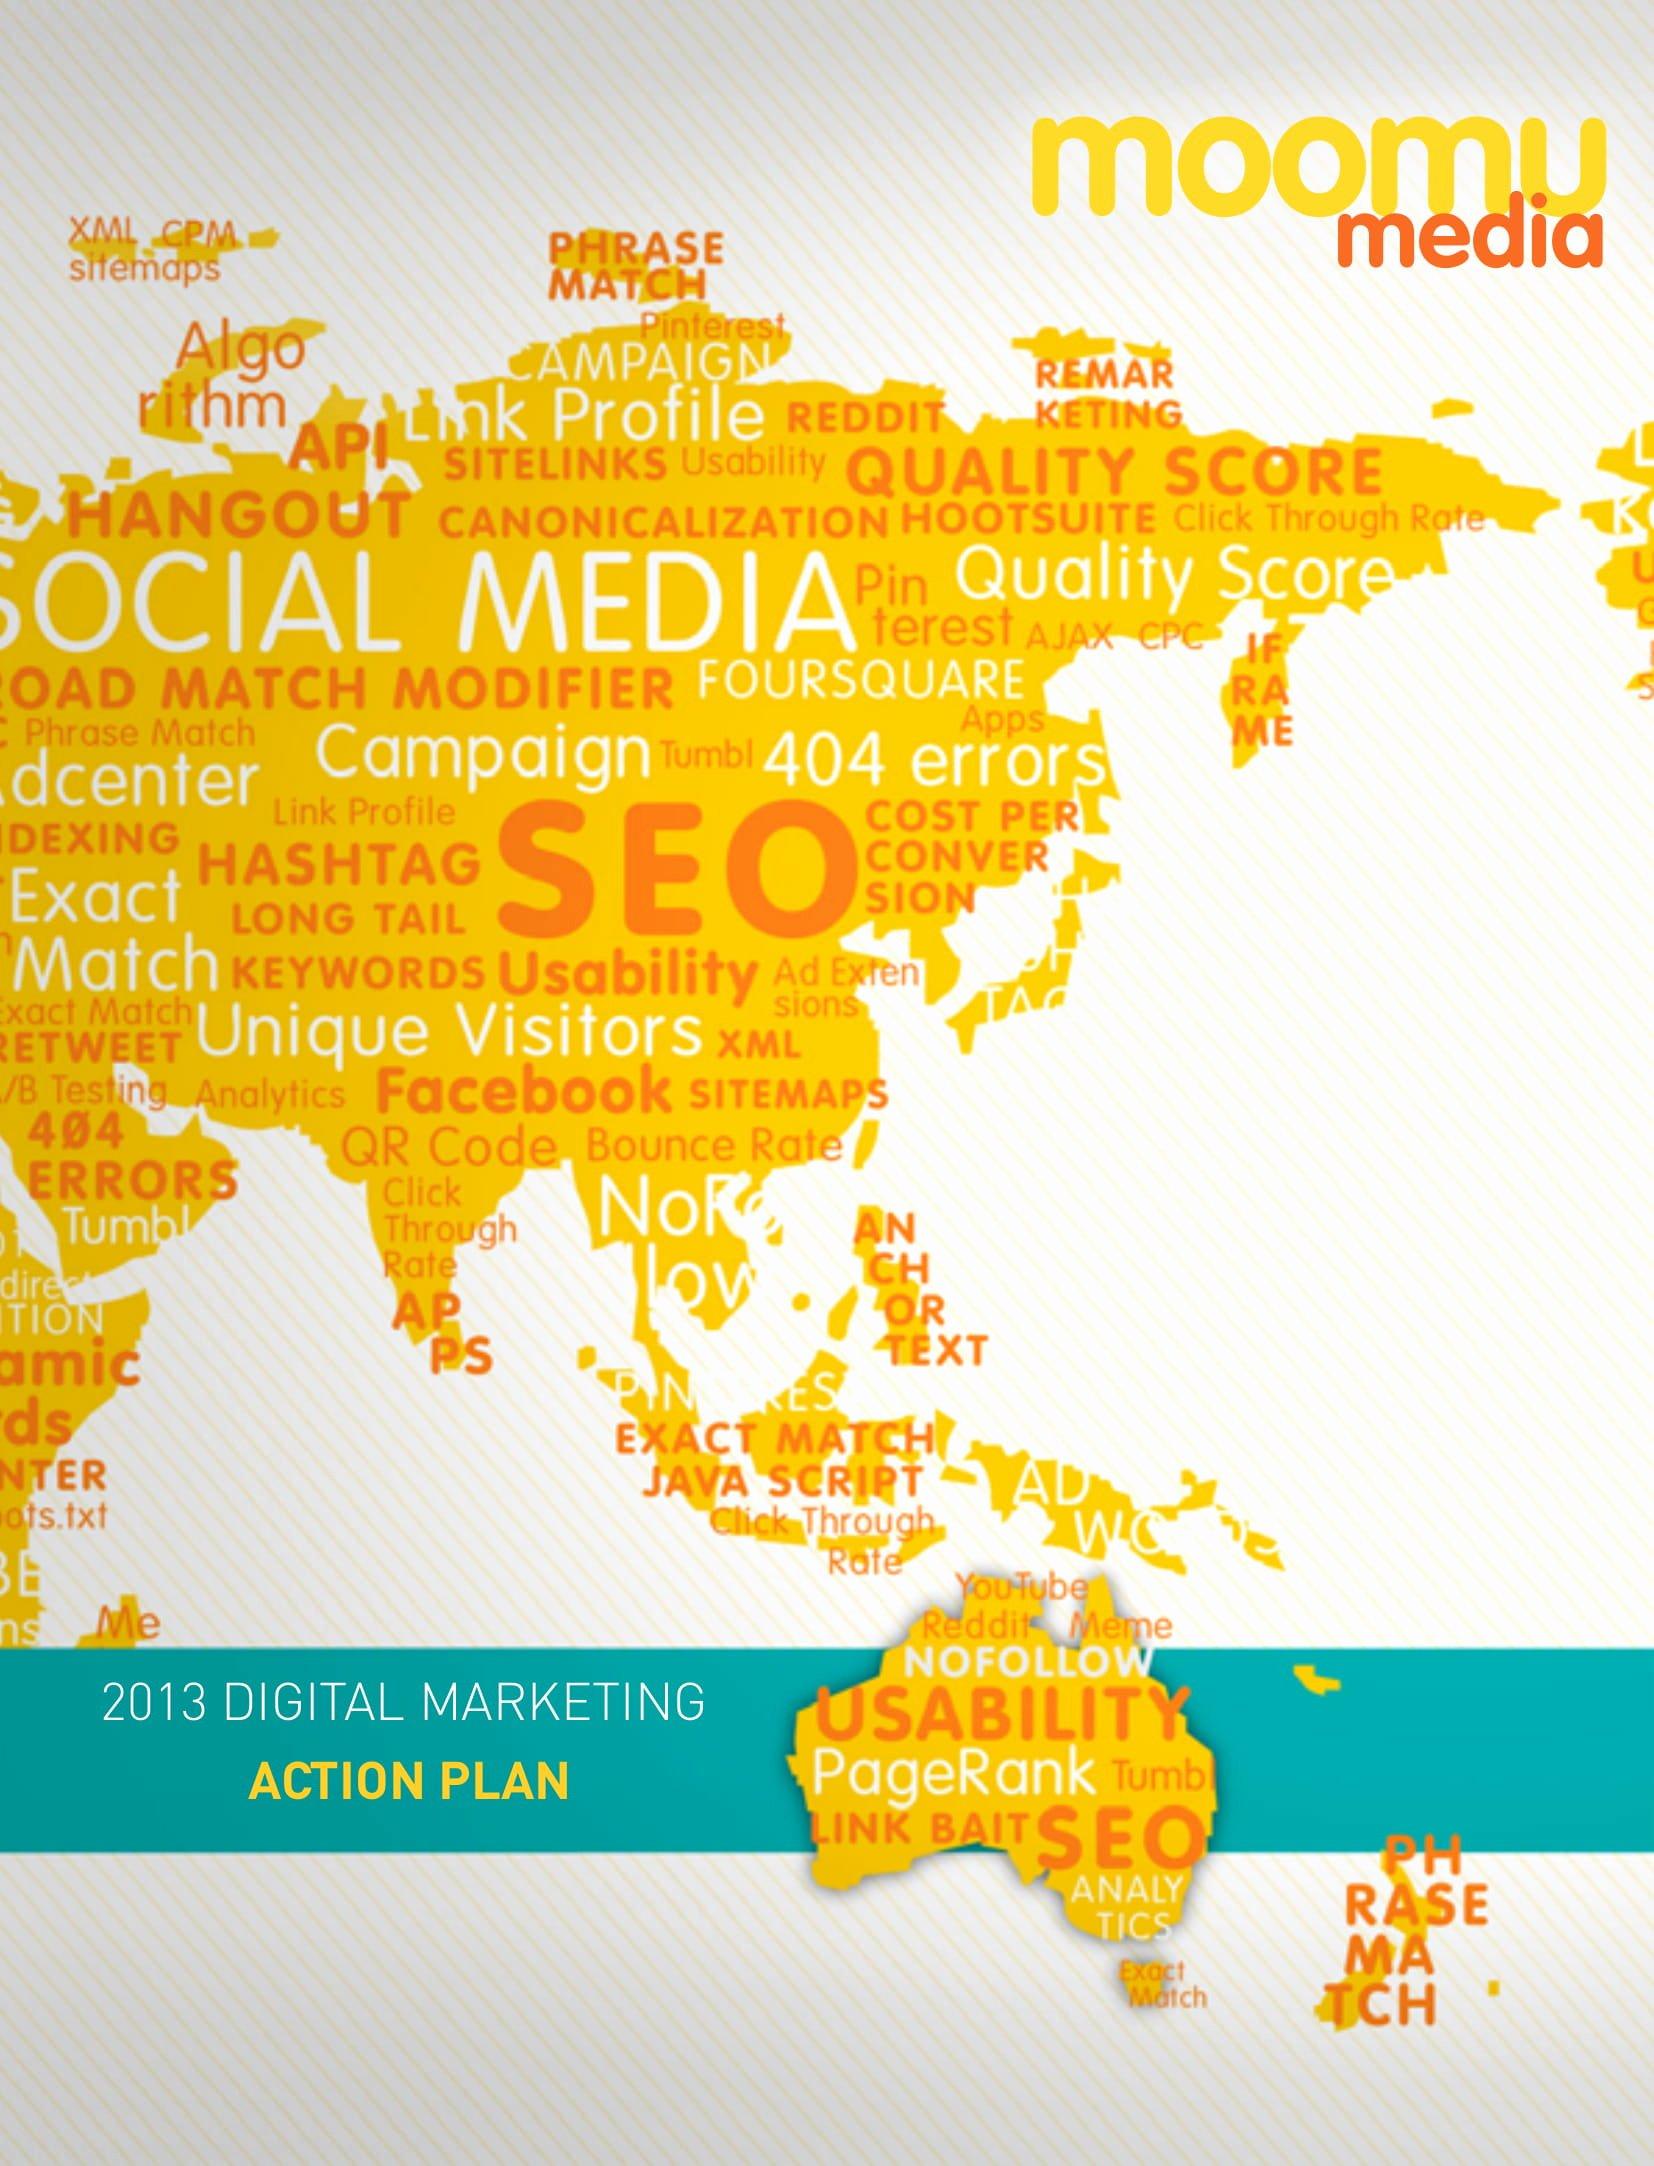 Marketing Action Plan Templates Inspirational 10 Marketing Action Plan Examples & Templates